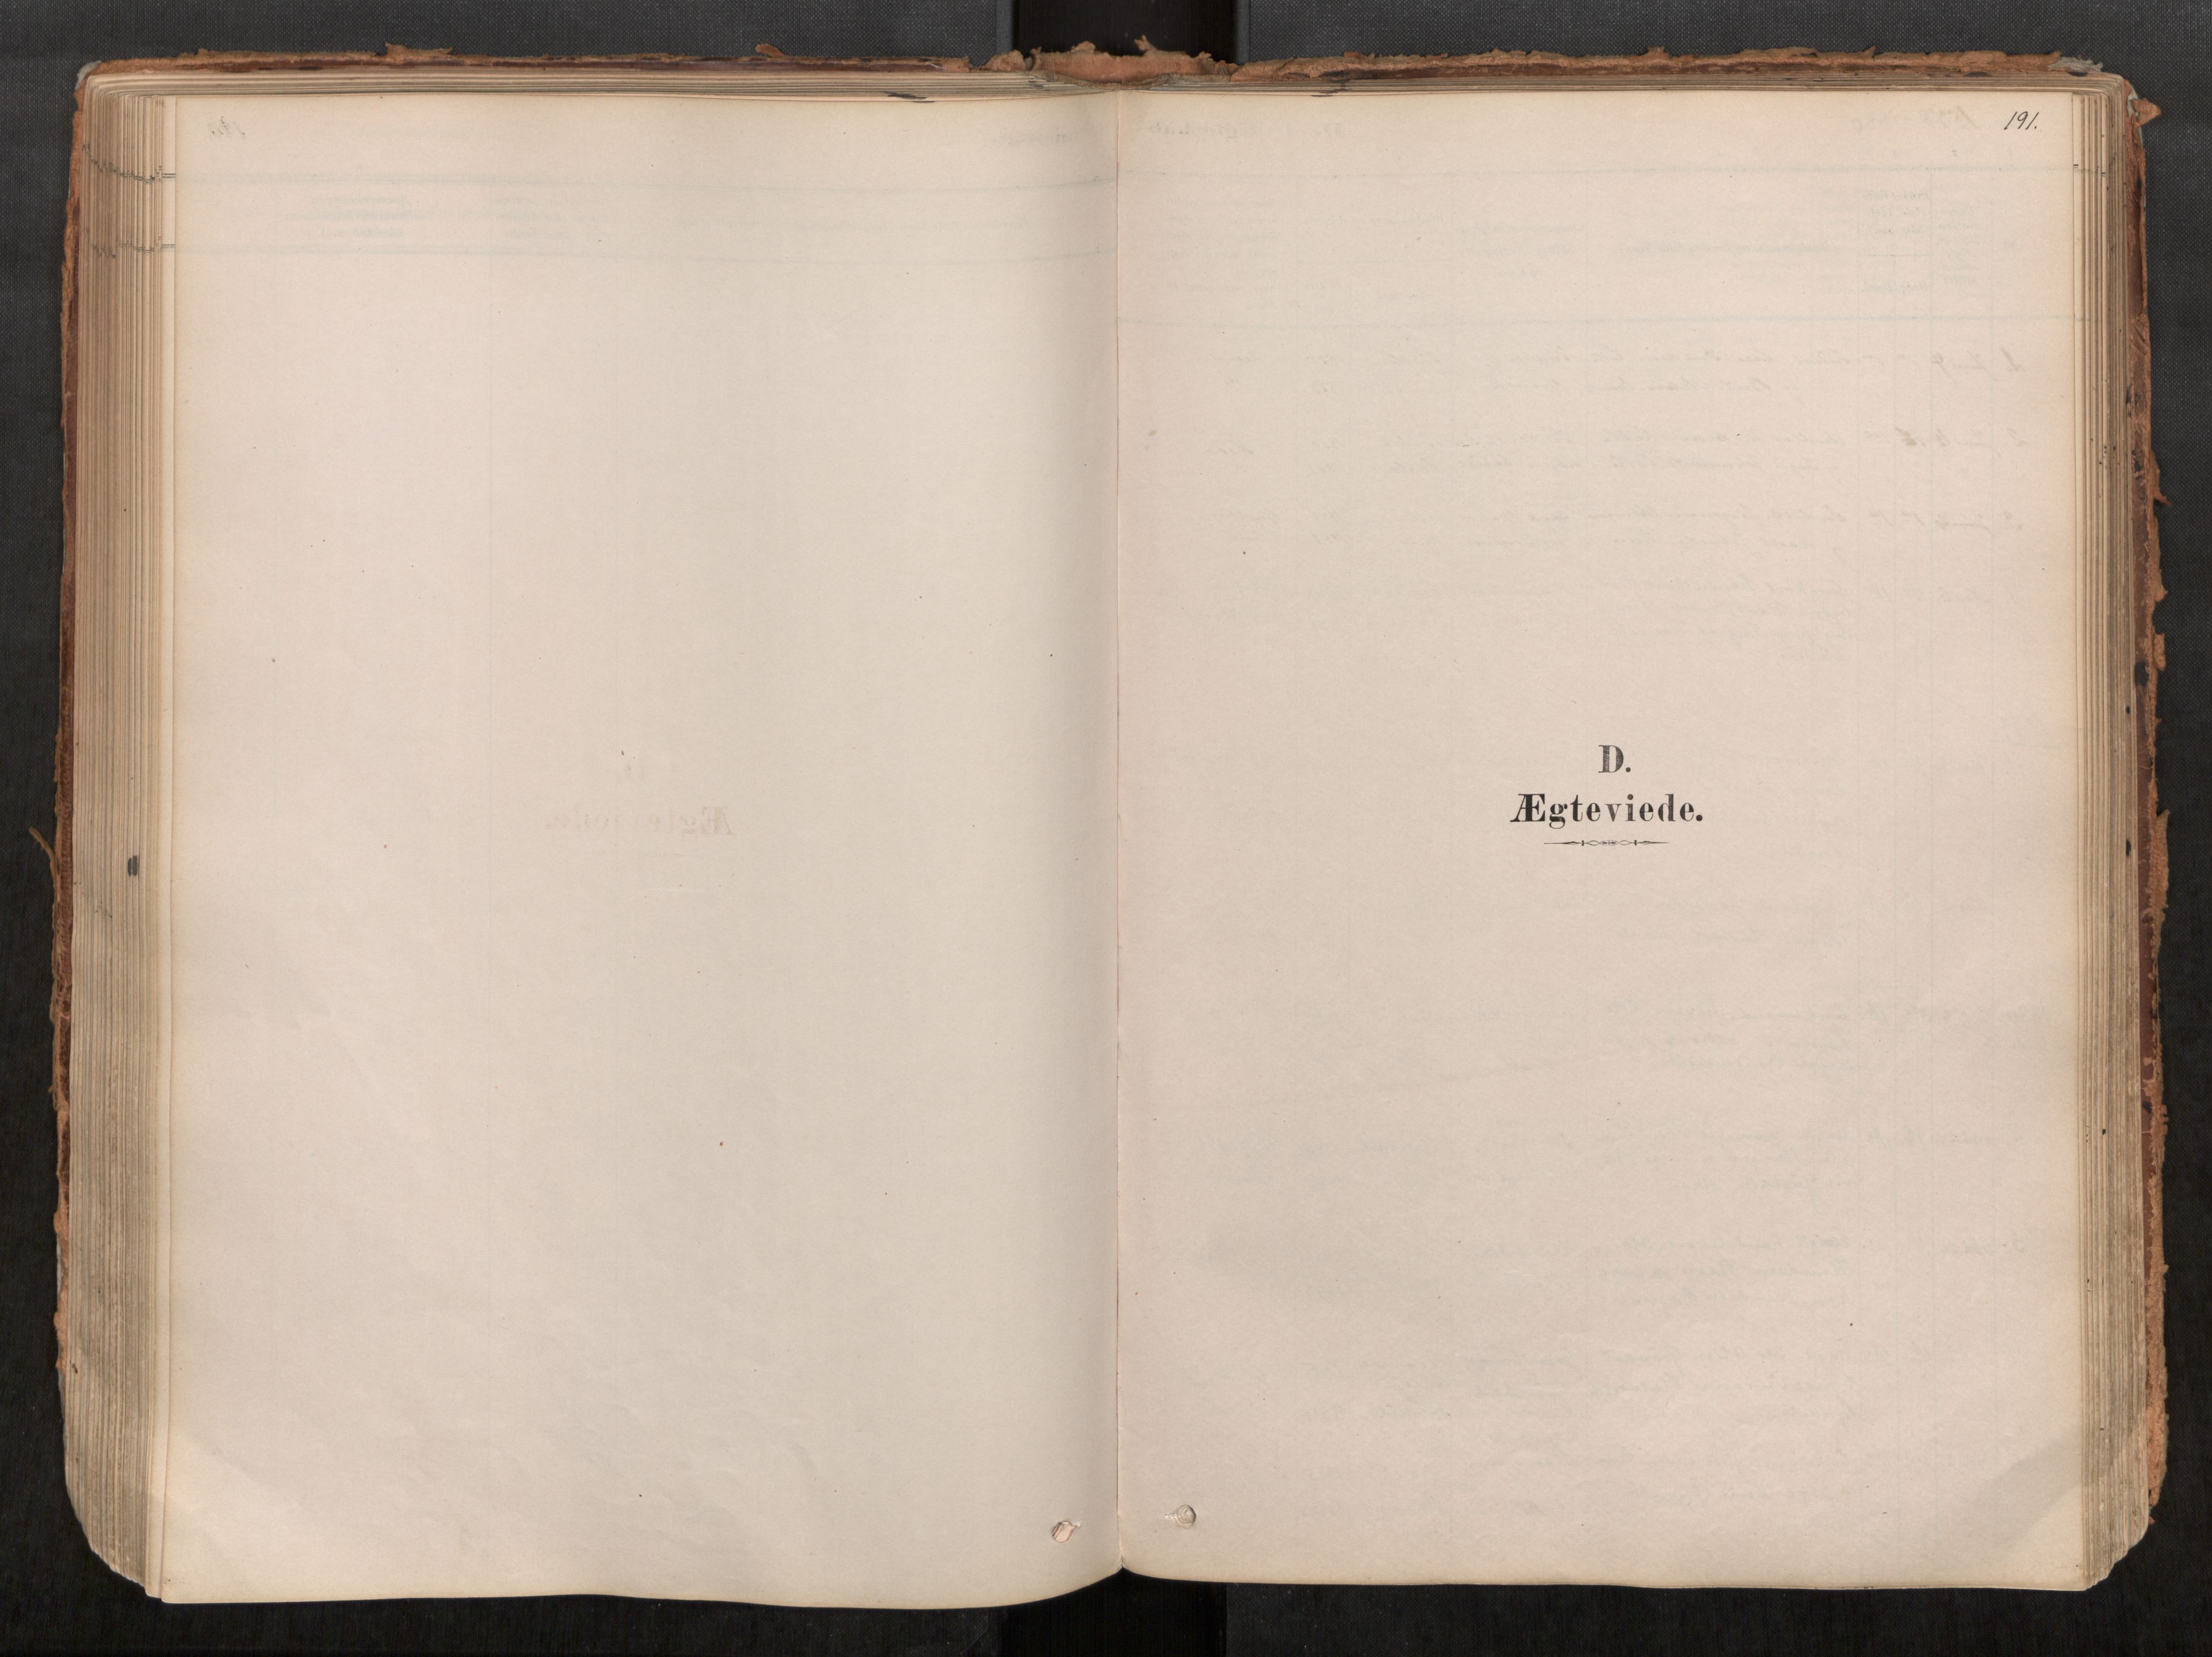 SAT, Grytten sokneprestkontor, Ministerialbok nr. 545A03, 1878-1920, s. 191